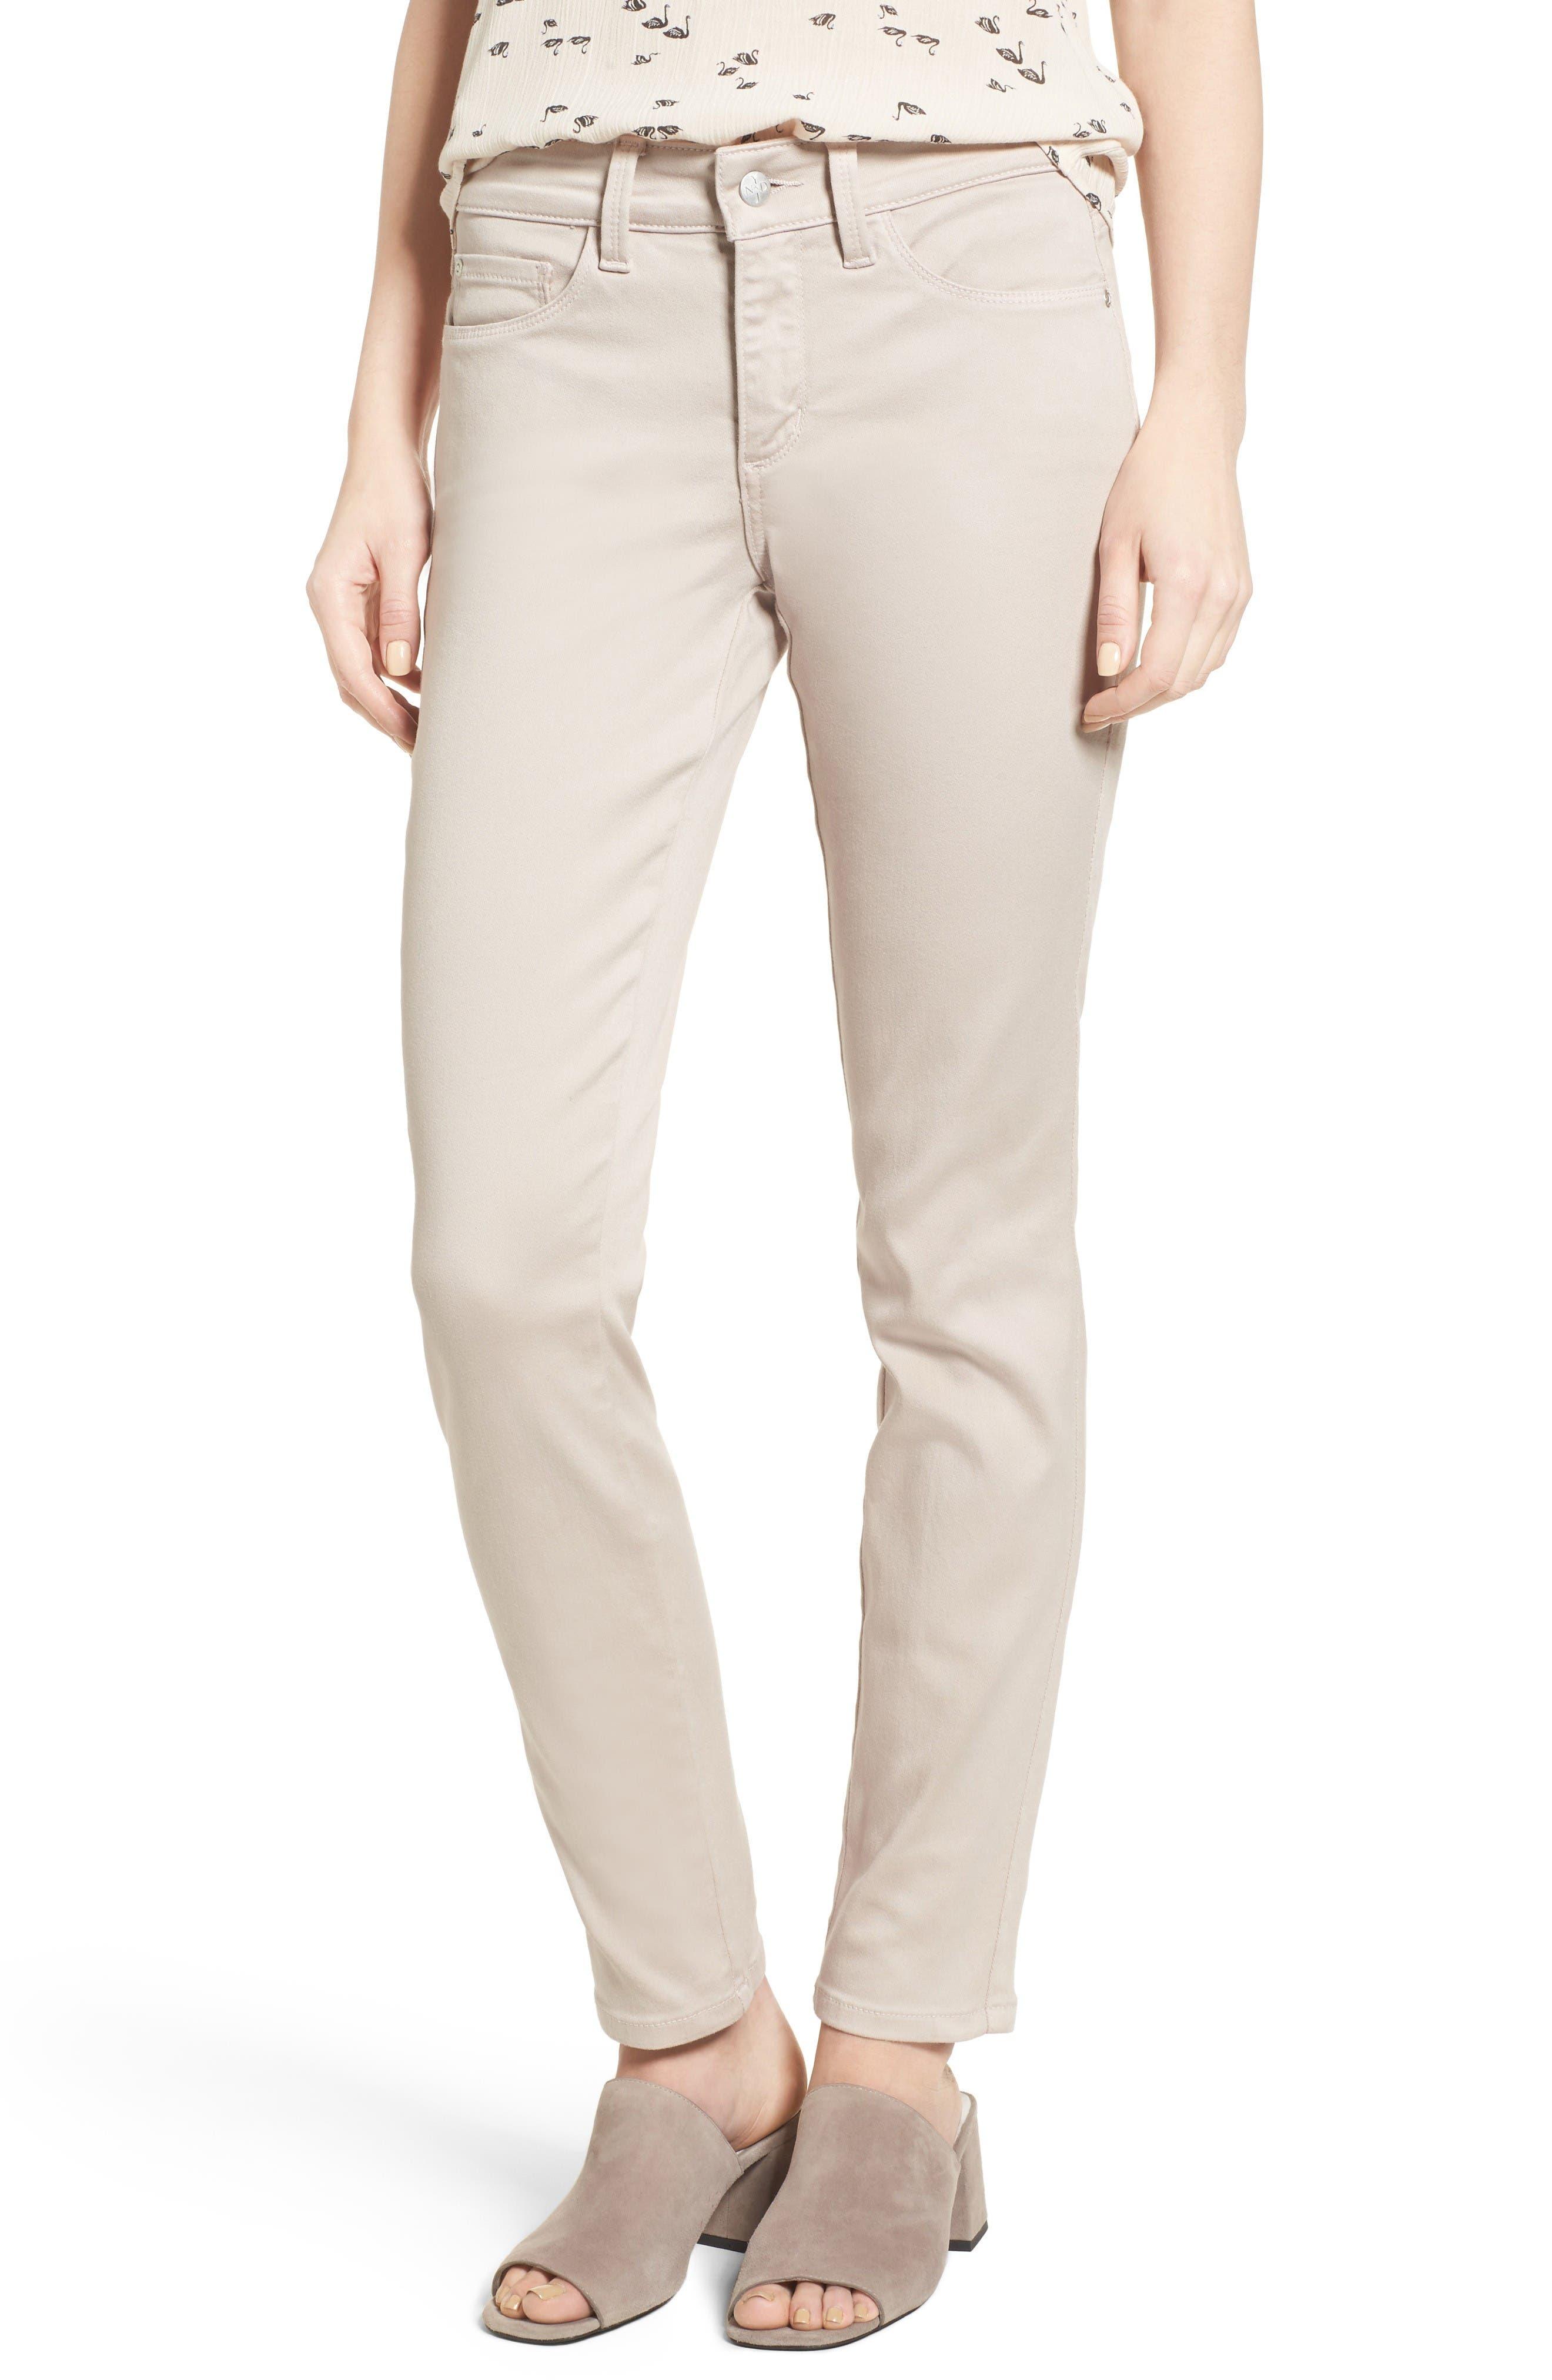 Alternate Image 1 Selected - NYDJ Alina Colored Stretch Skinny Jeans (Regular & Petite)